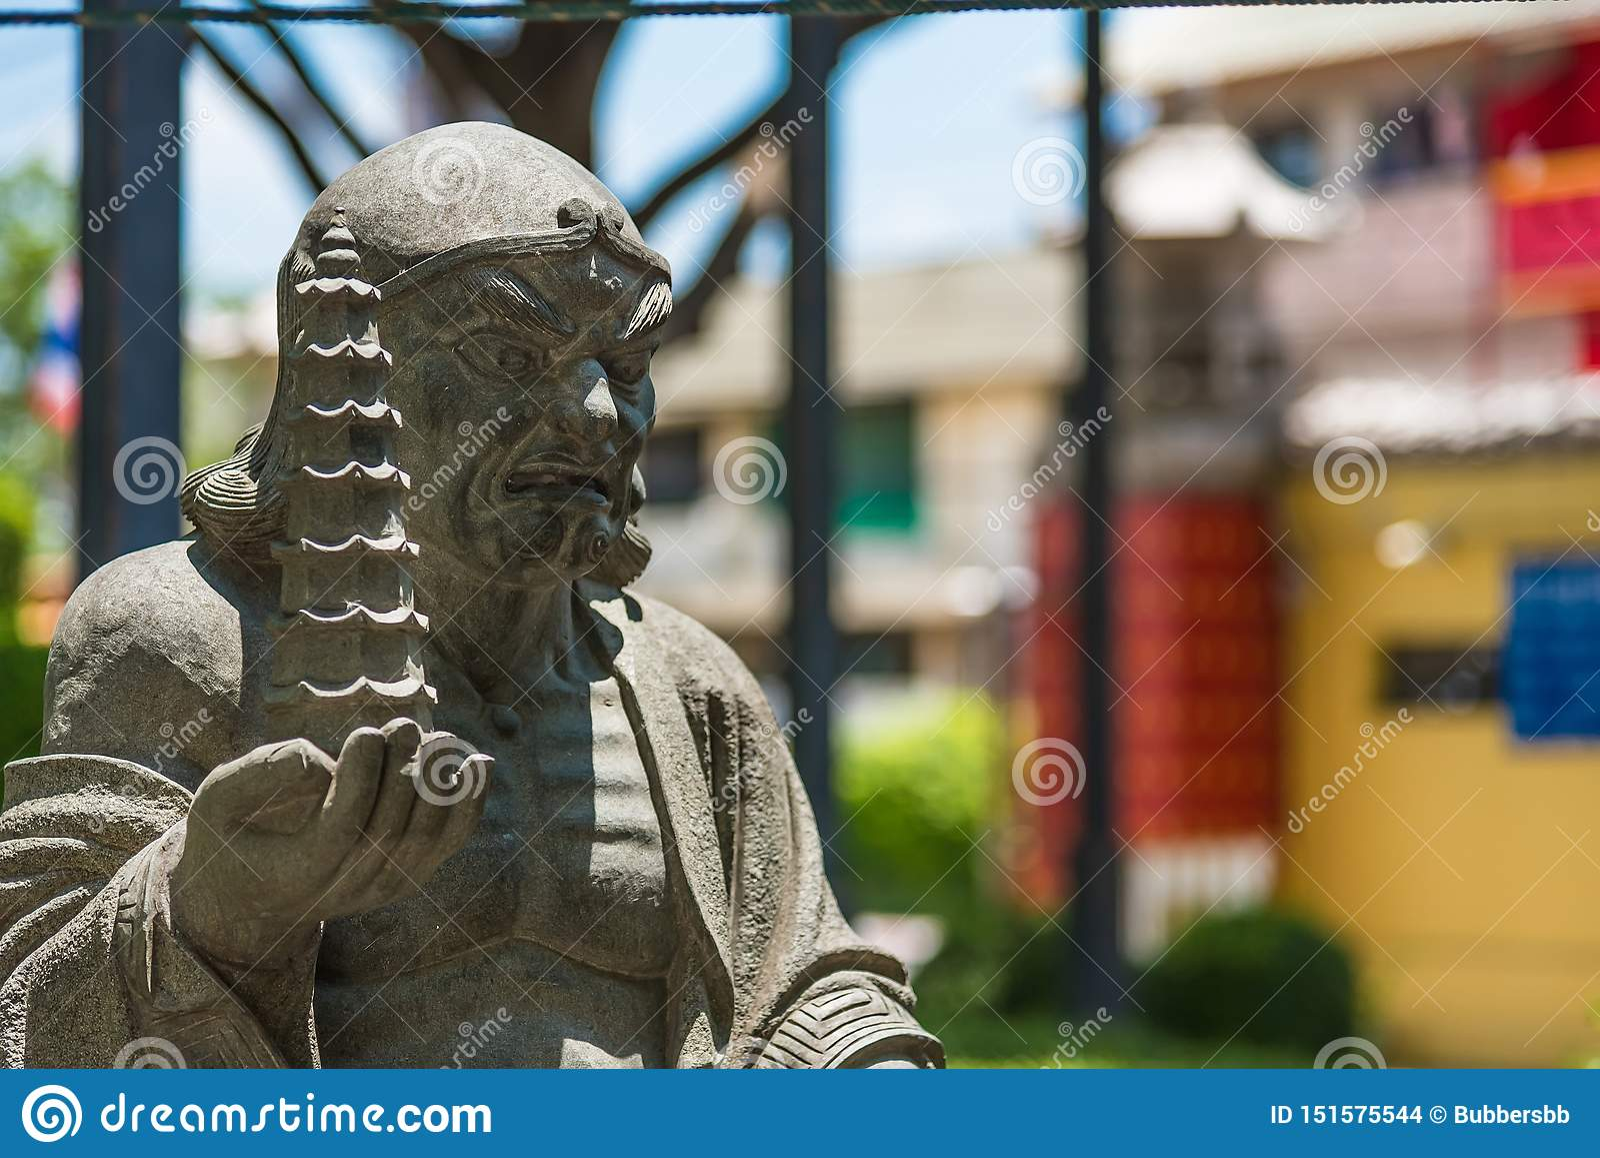 Chinese god statue of Wat Borom Racha Kanchanapisek Anusorn& x28;Leng nuei Yee Branch 2& x29;,A popular Chinese temple to merit